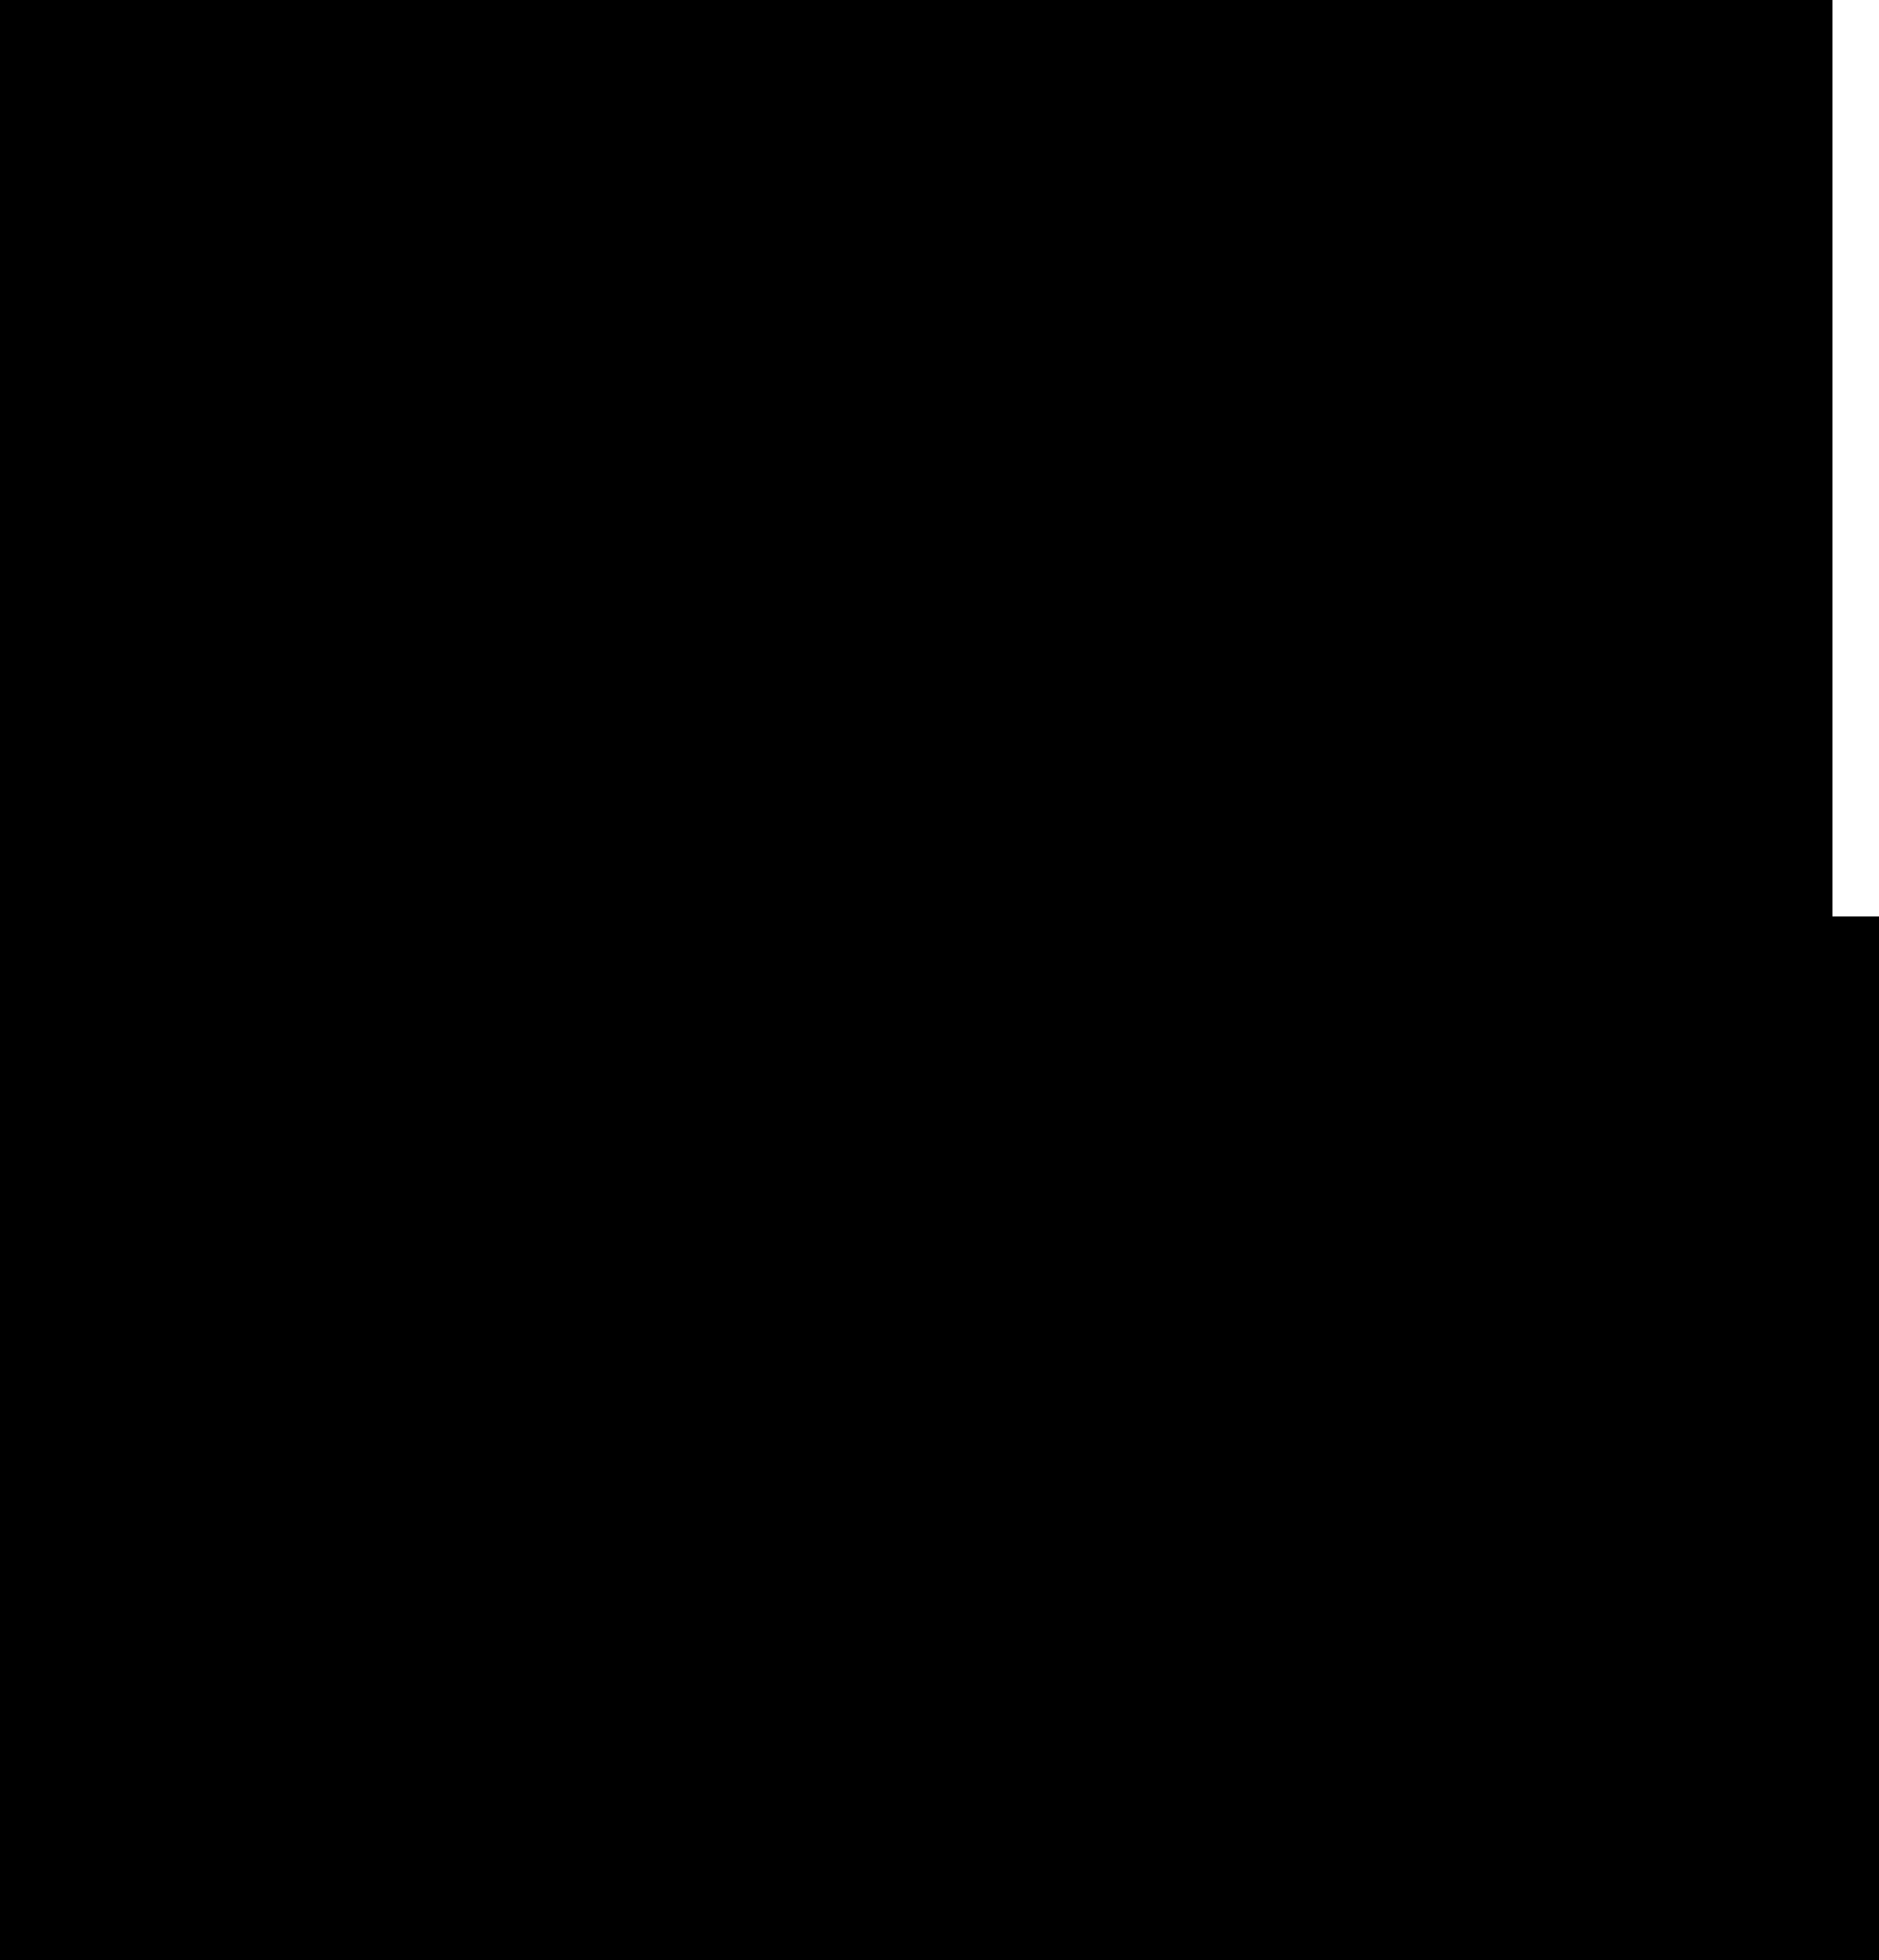 Car Values additionally Autocollant Moto Suzuki Intruder Logo besides Ausmalbilder Automarken Malvorlagen further Autocollant Maserati Quattroporte Logo besides Alfa Romeo Sauber. on alfa romeo logo